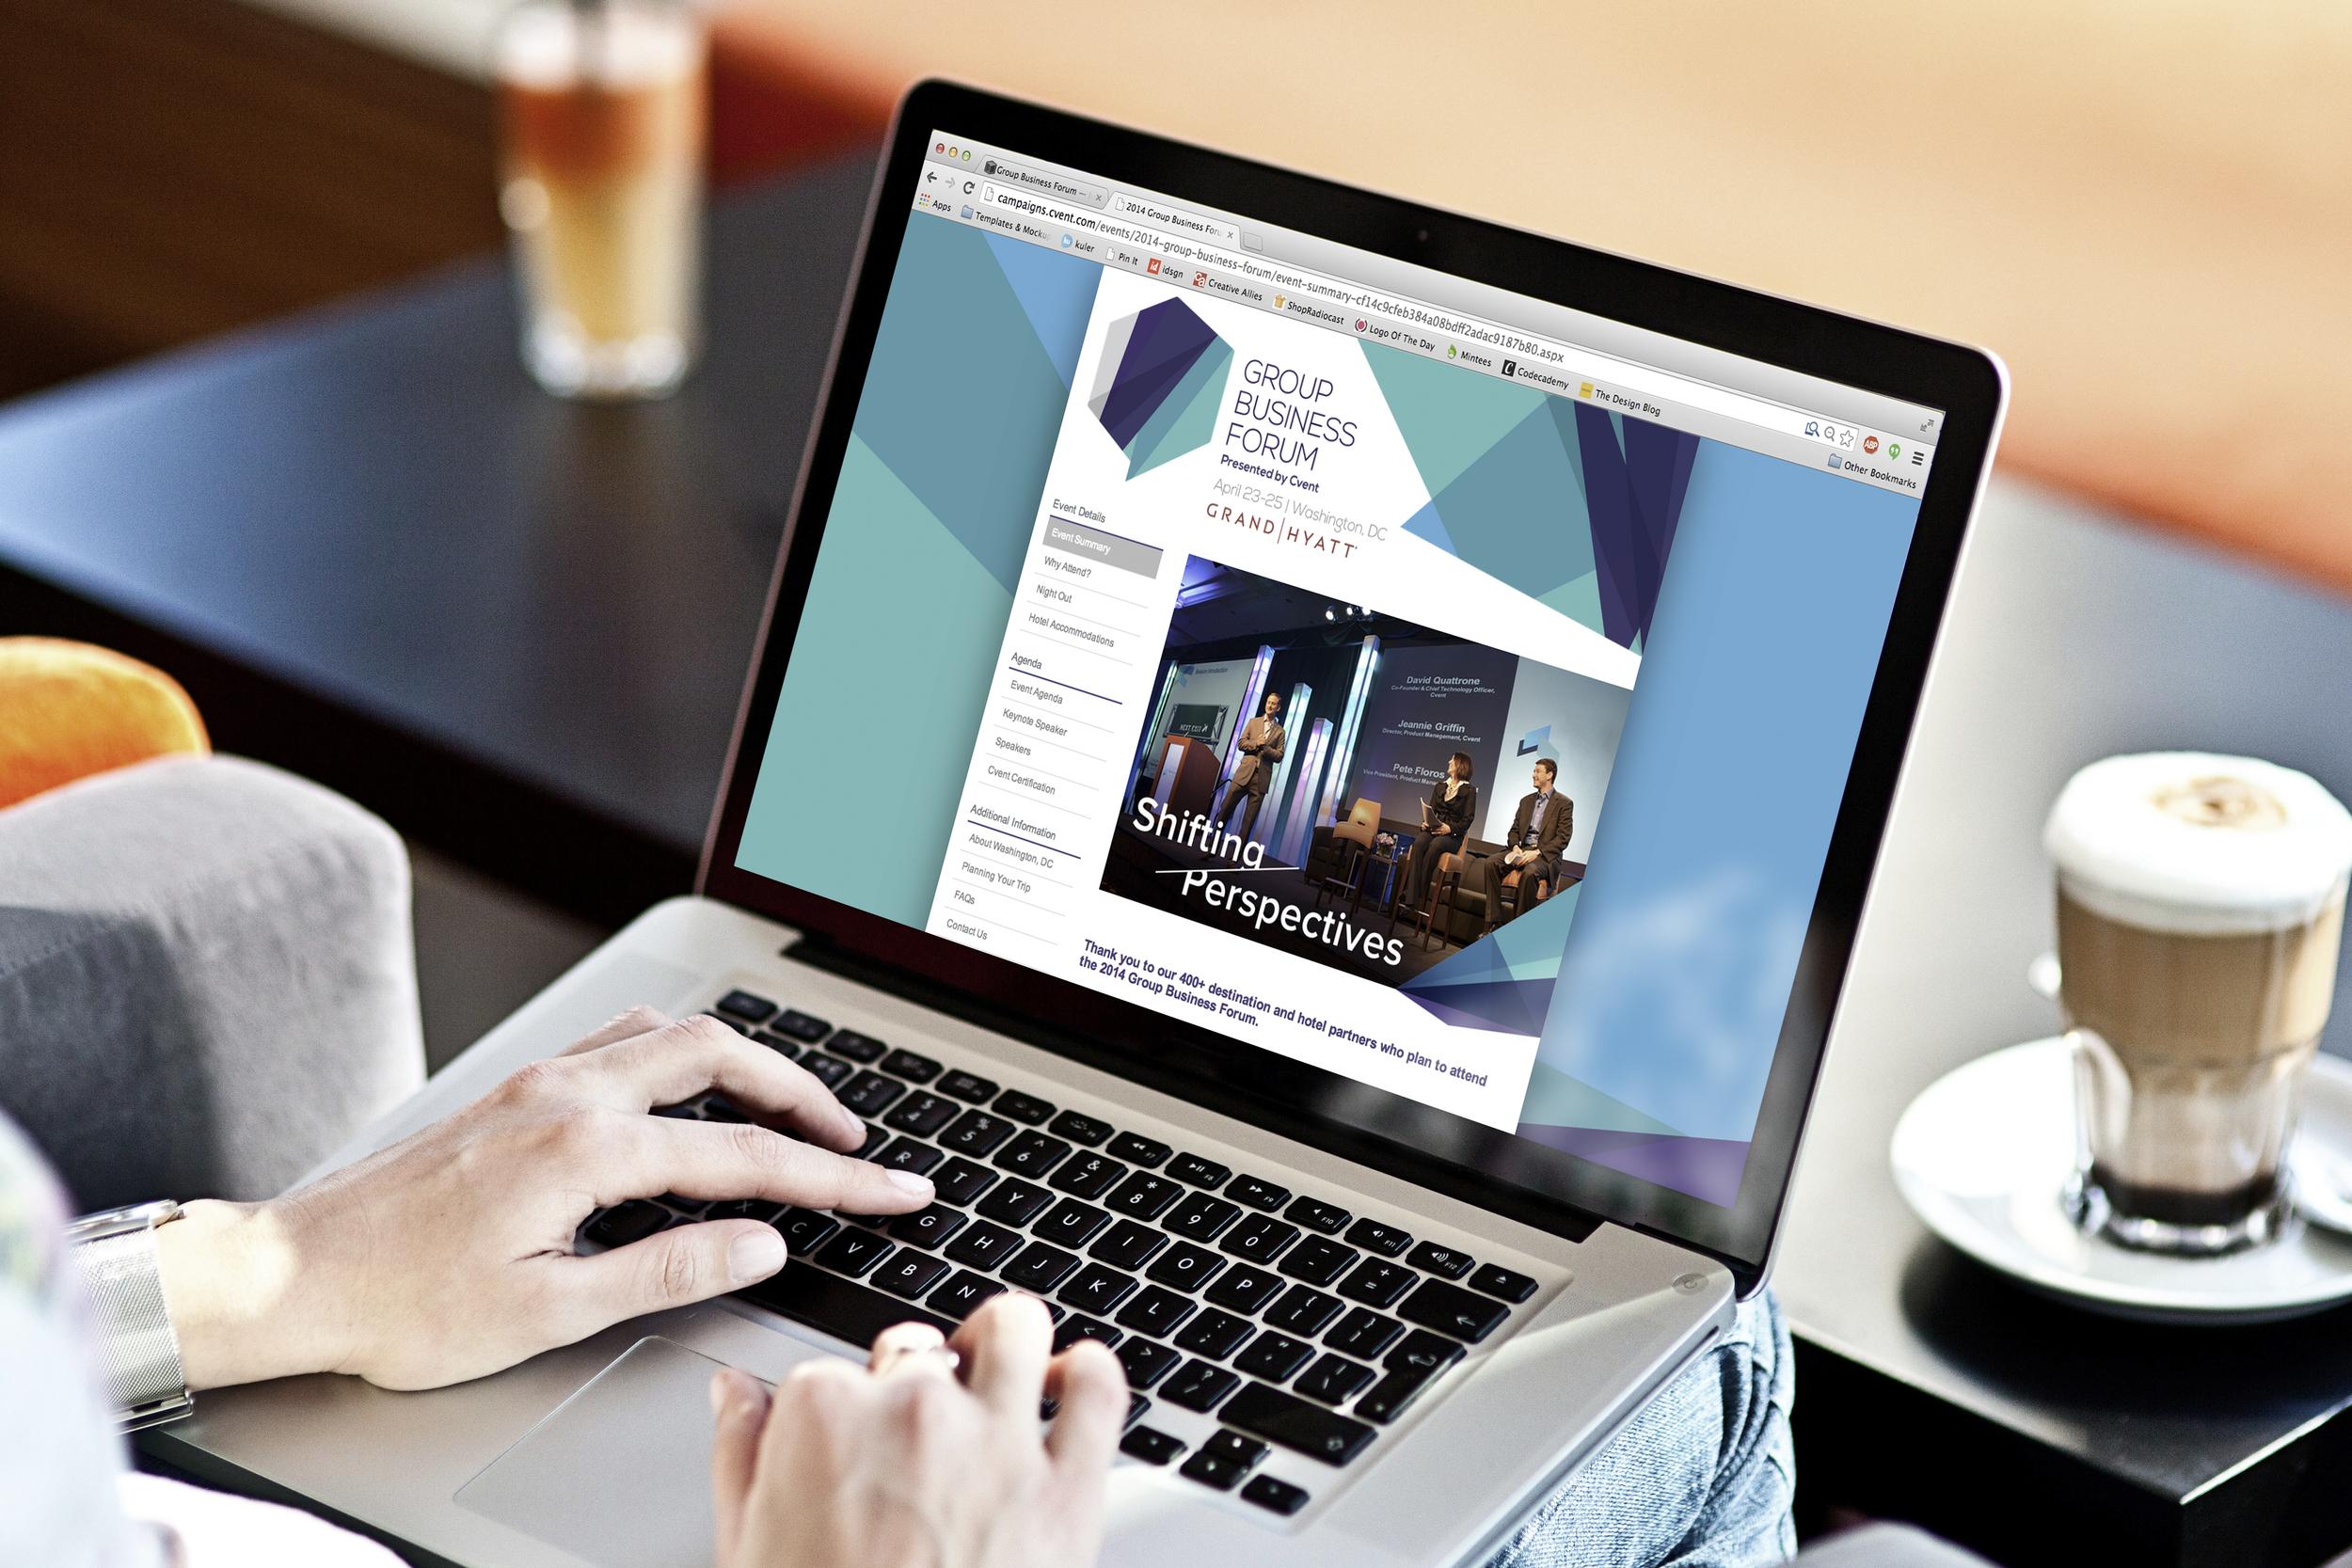 Group Business Forum event website